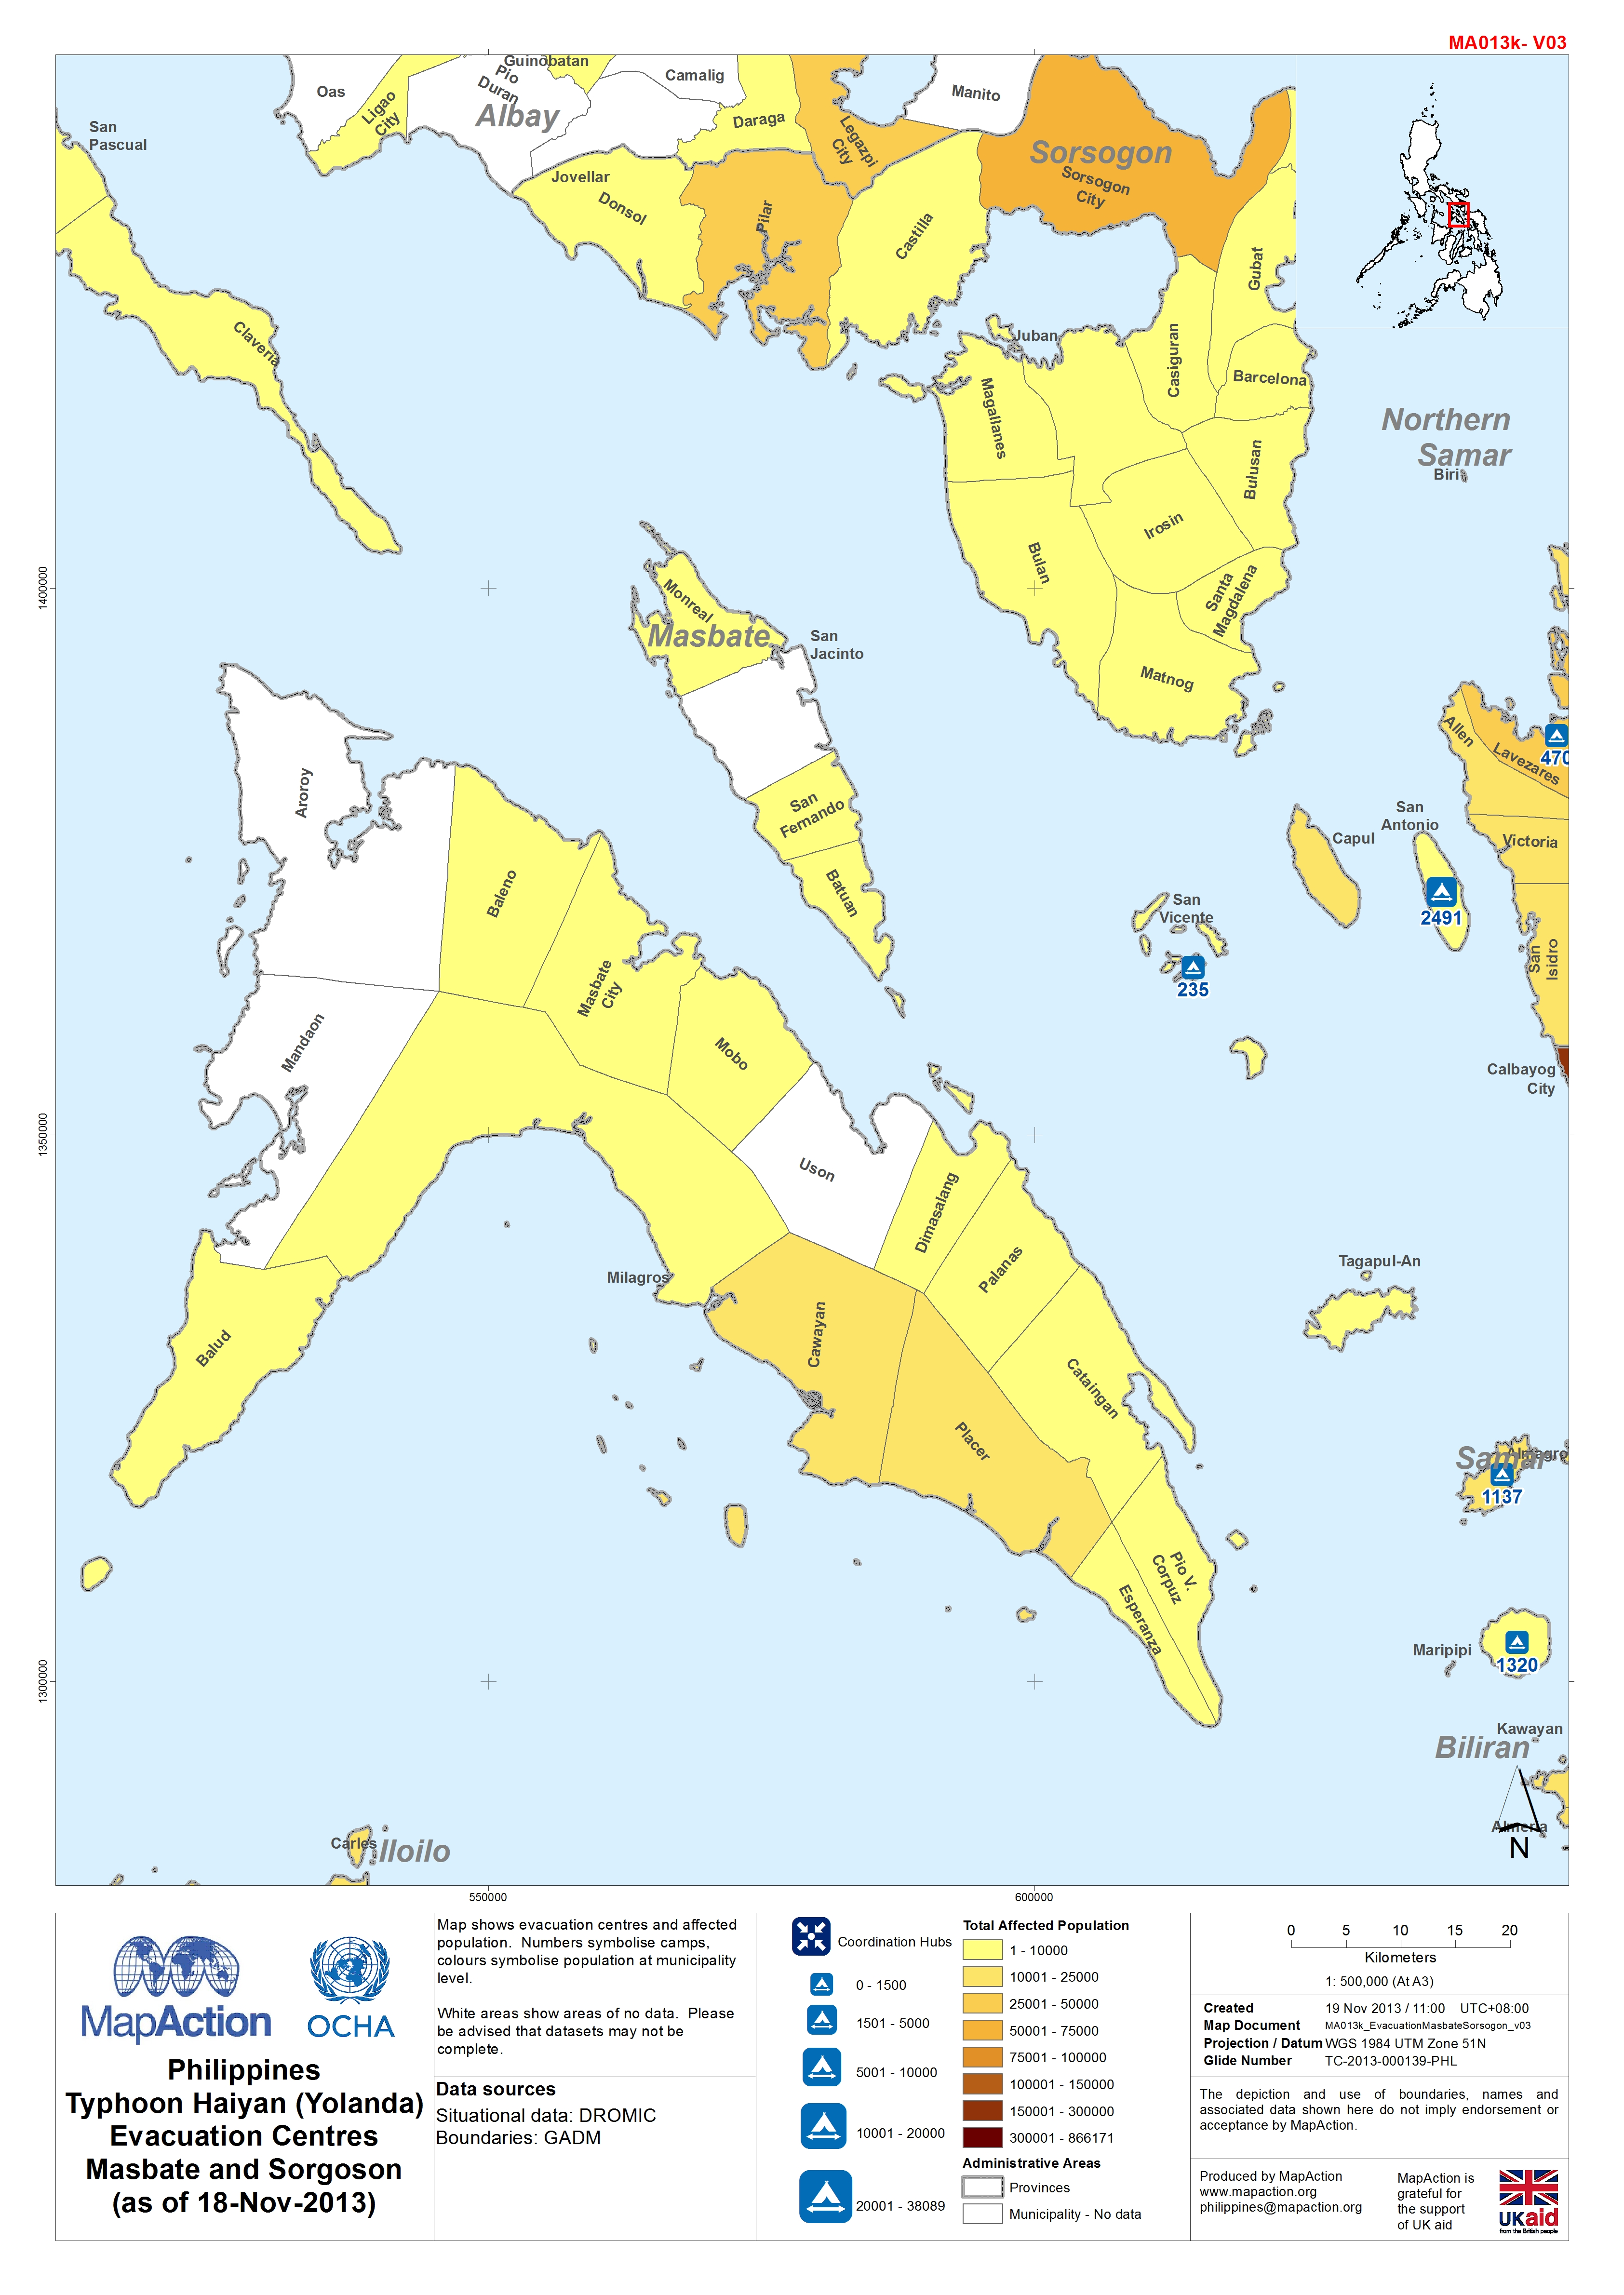 Masbate Philippines Map.Philippines Typhoon Haiyan Yolanda Evacuation Centres Masbate And